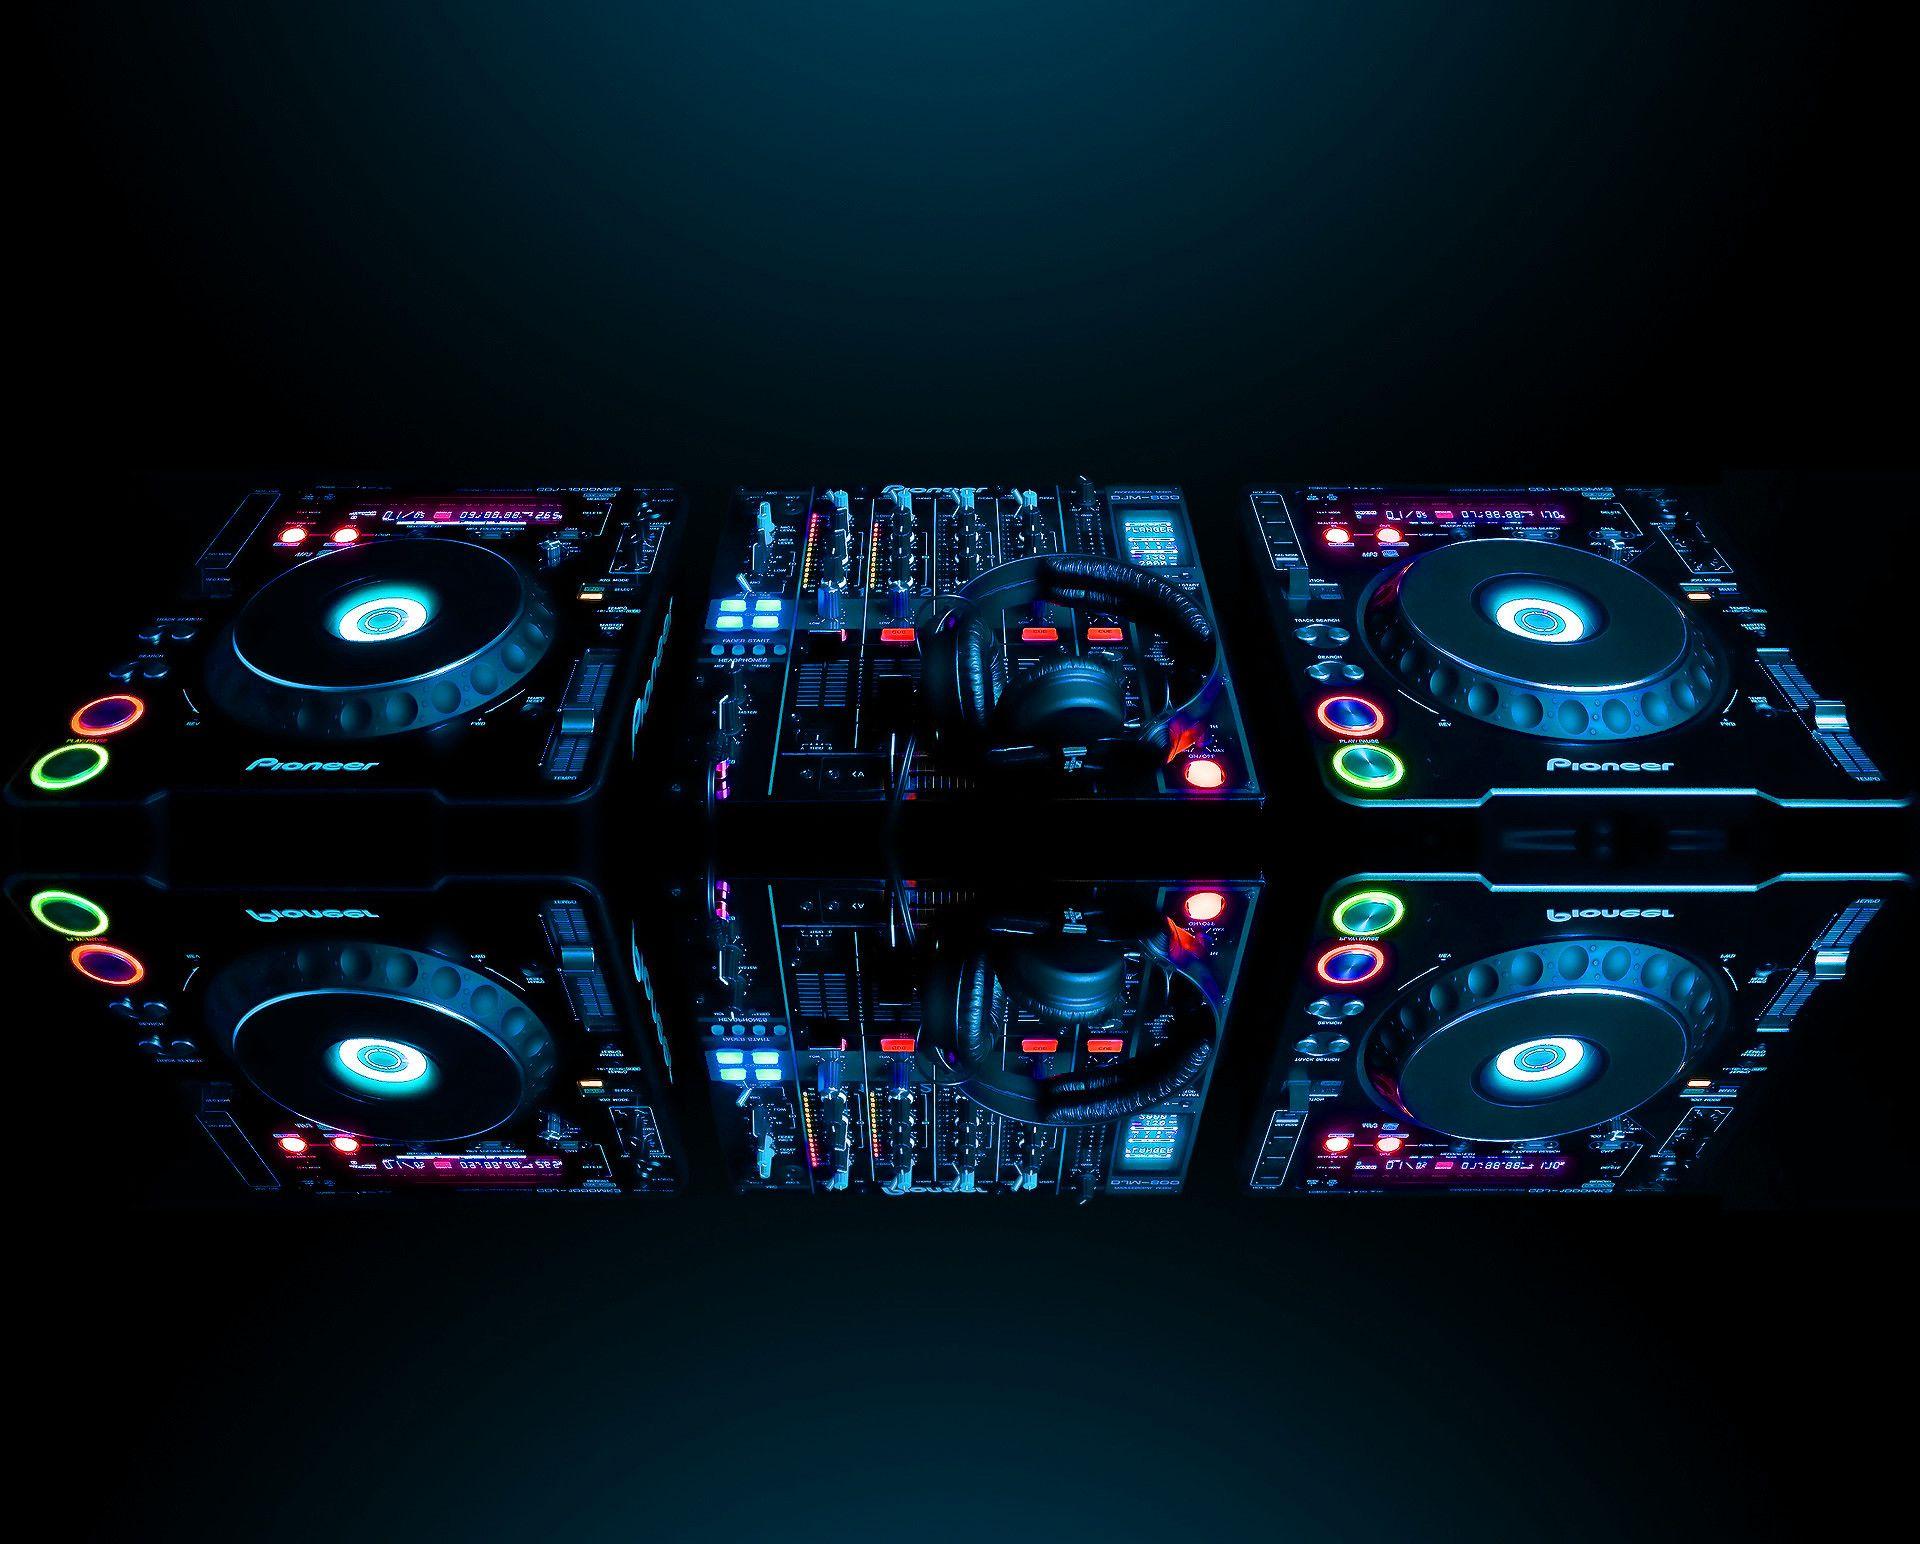 Res 1920x1544 Wallpaper Dj Turntable Scheme Wallpapers Hi Tech Download Wallpaper Dj Mixing Dj Music Wallpaper